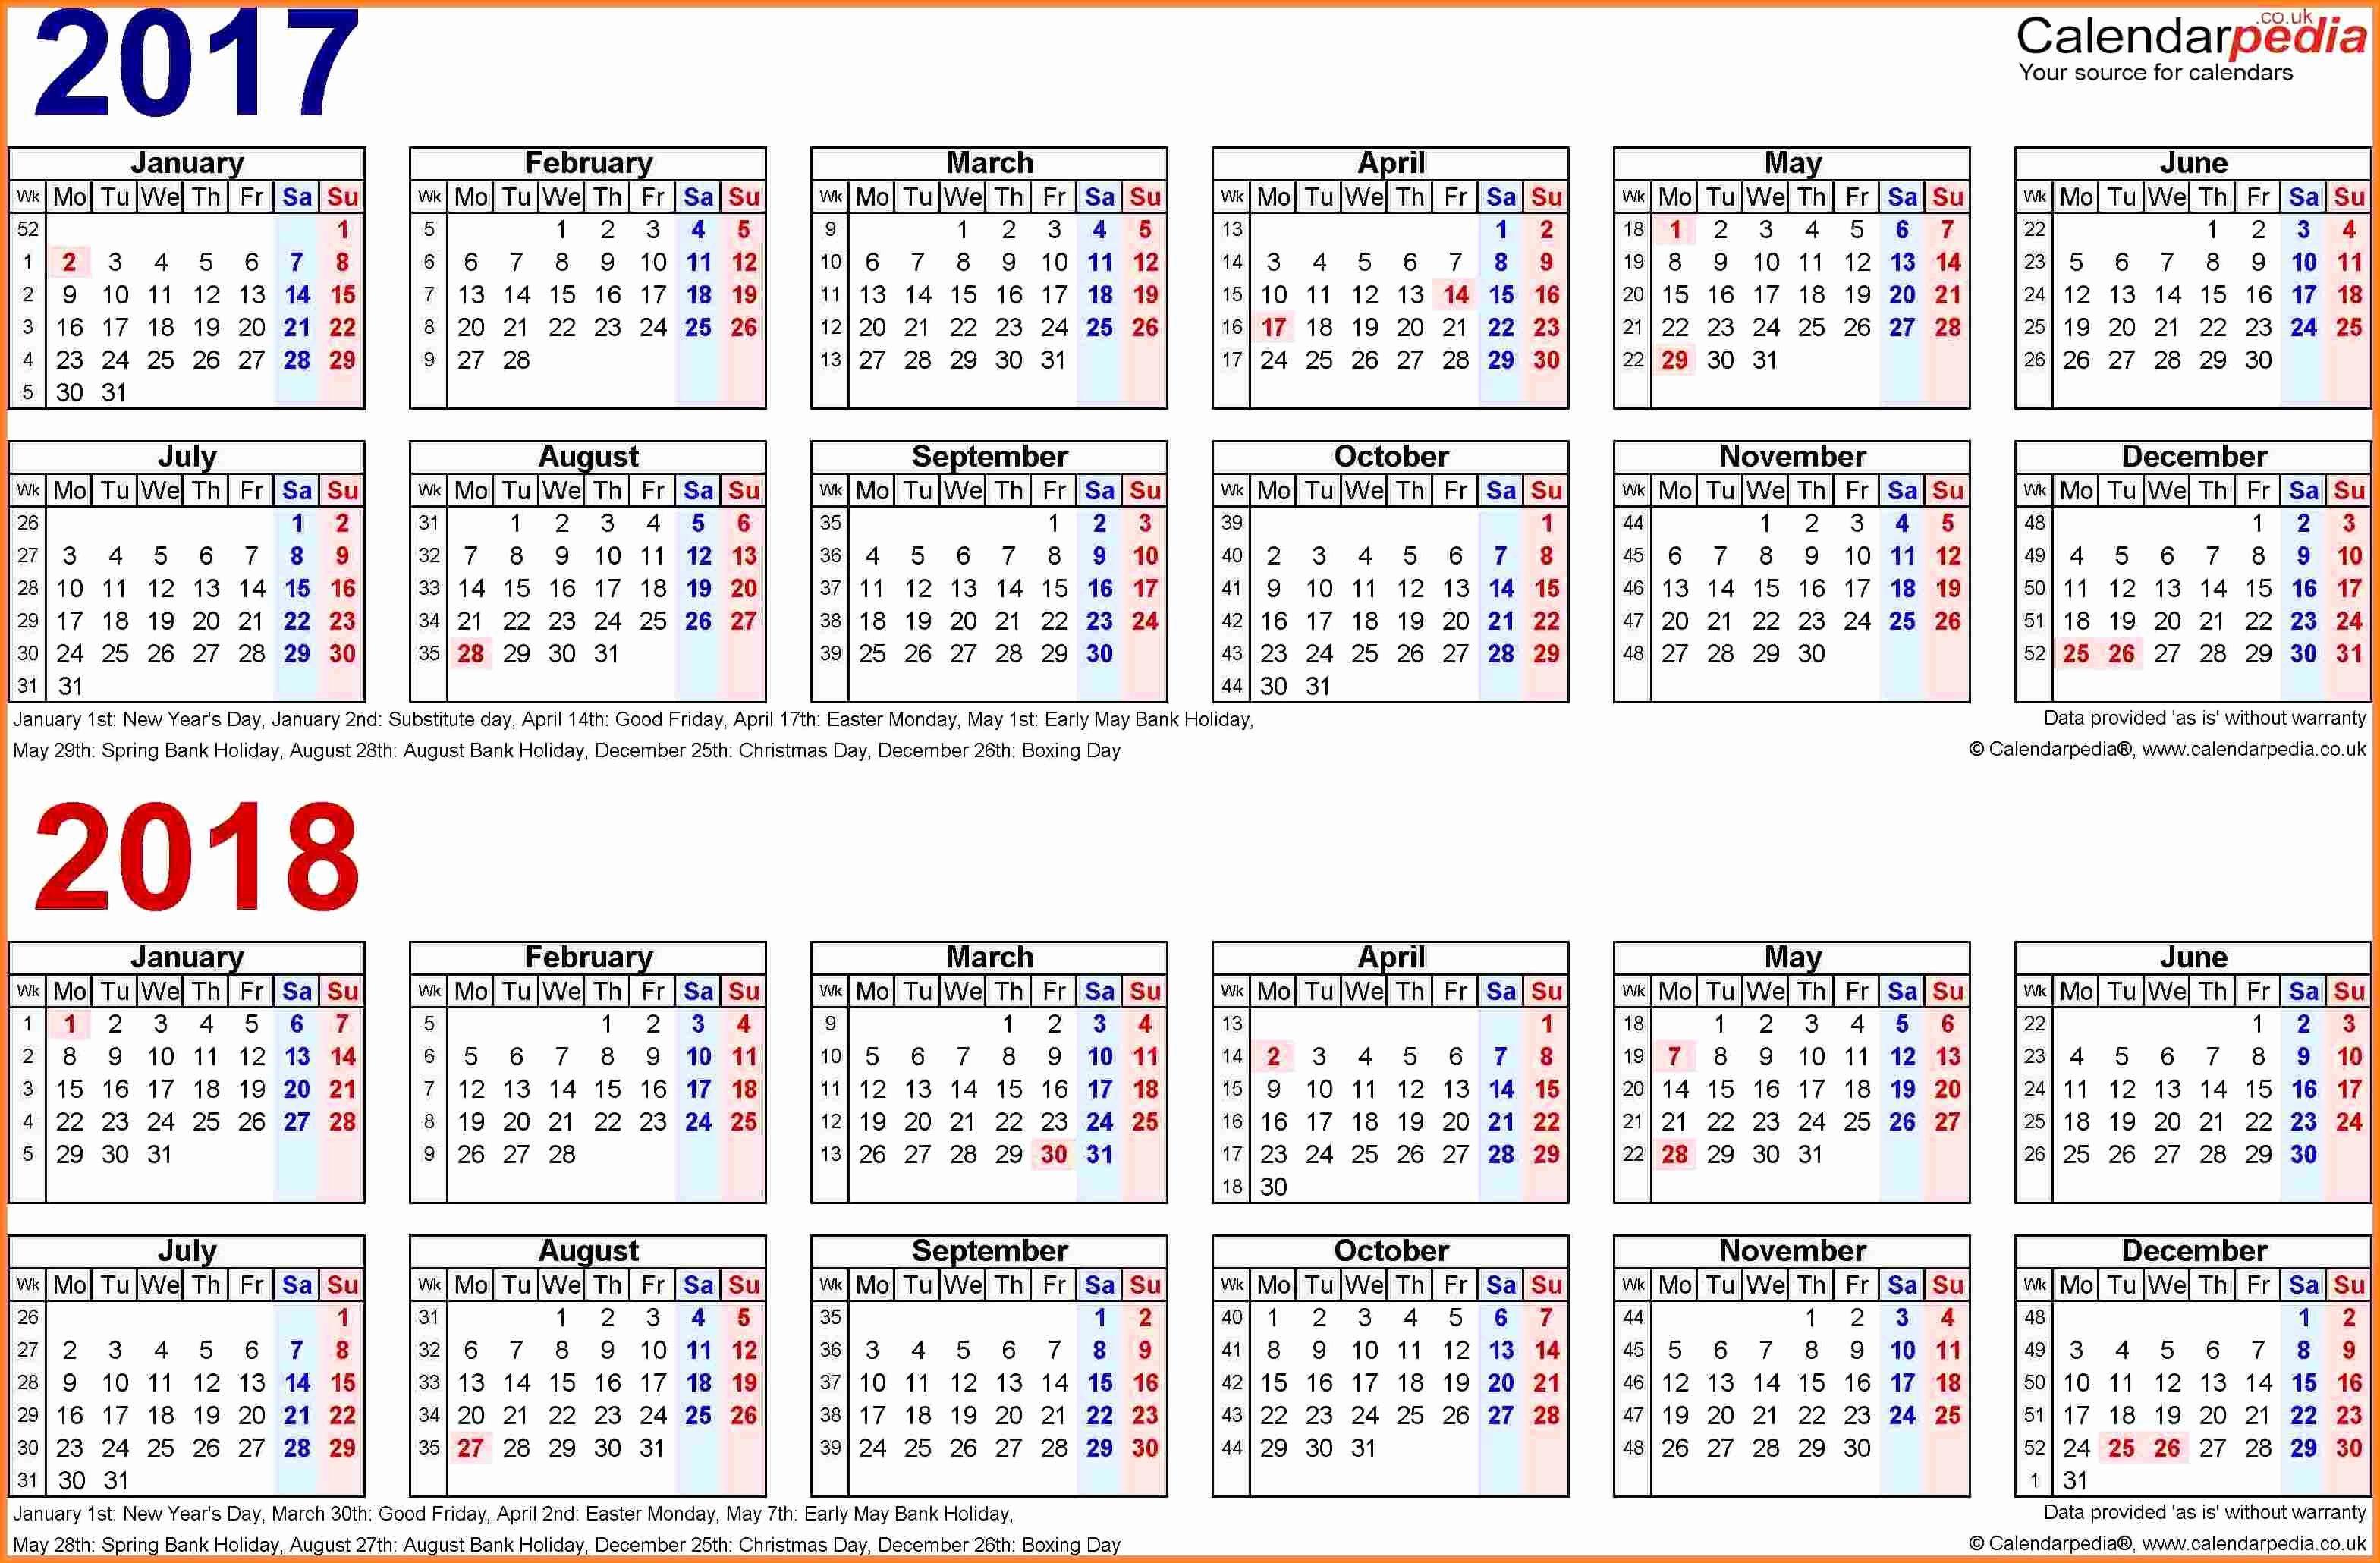 Payroll Calendar Template 2017 Elegant 12 Payroll Calendar Template 2017